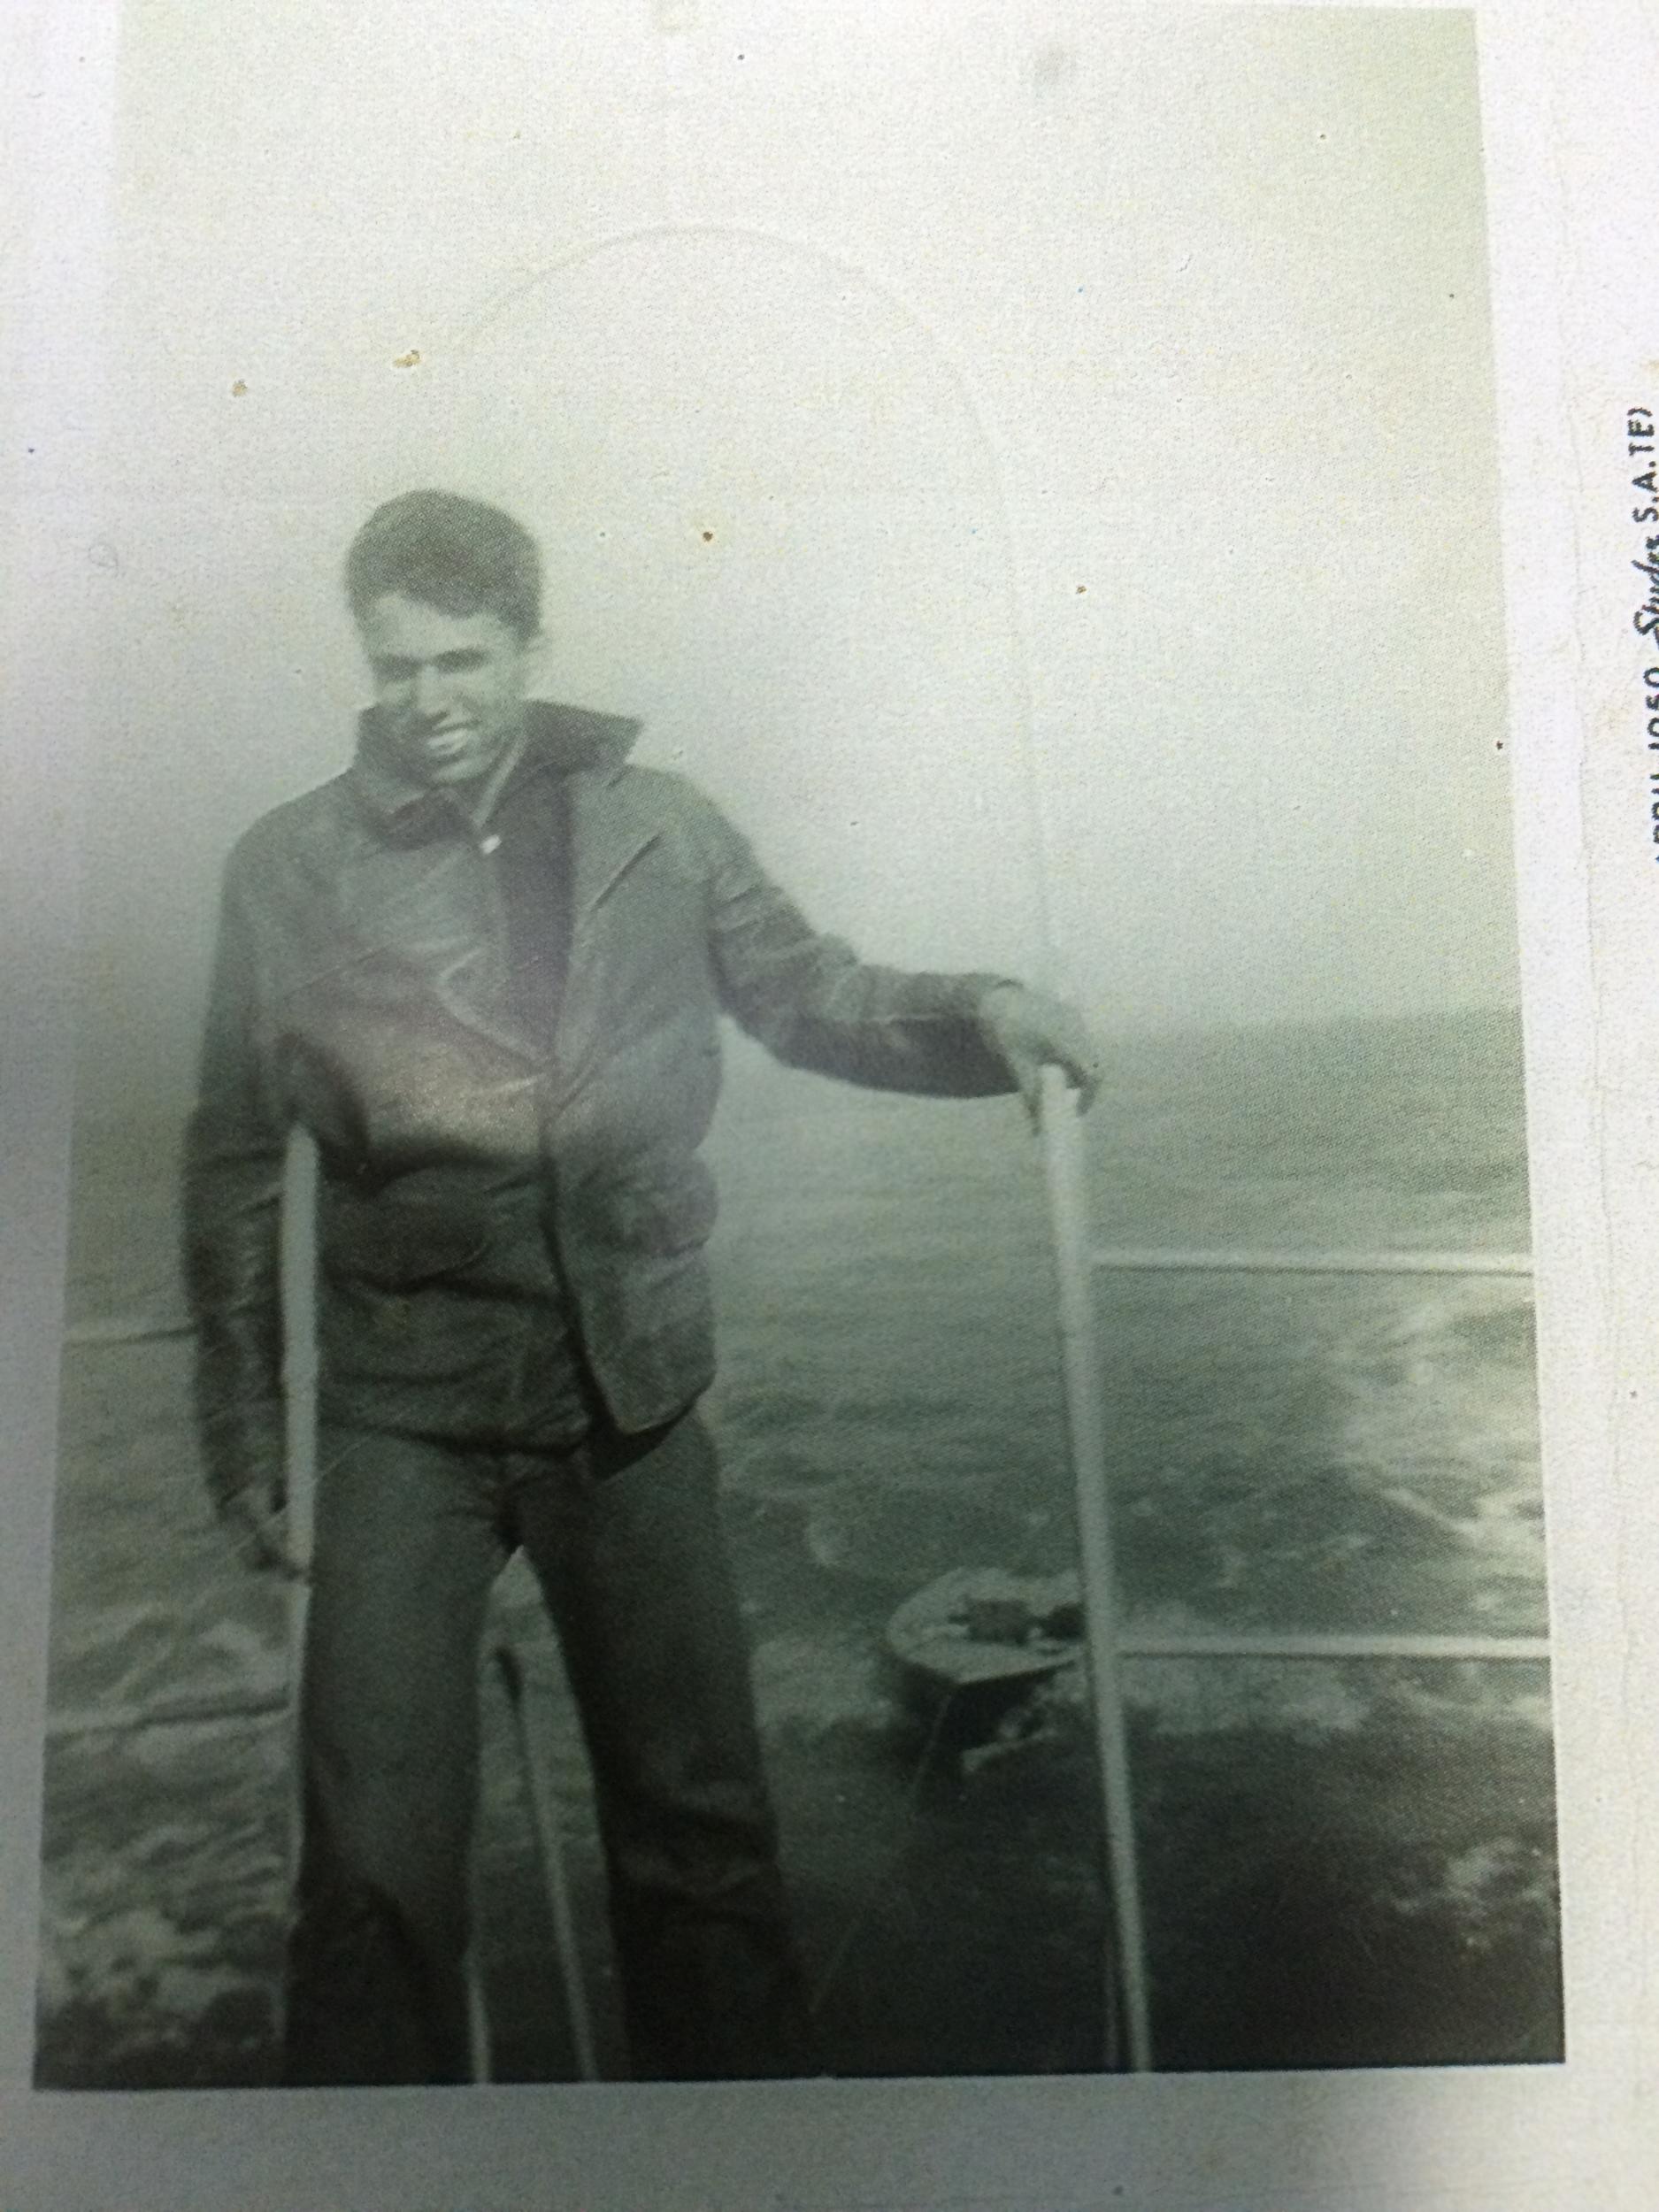 Rudy Ramirez exploring the great sea